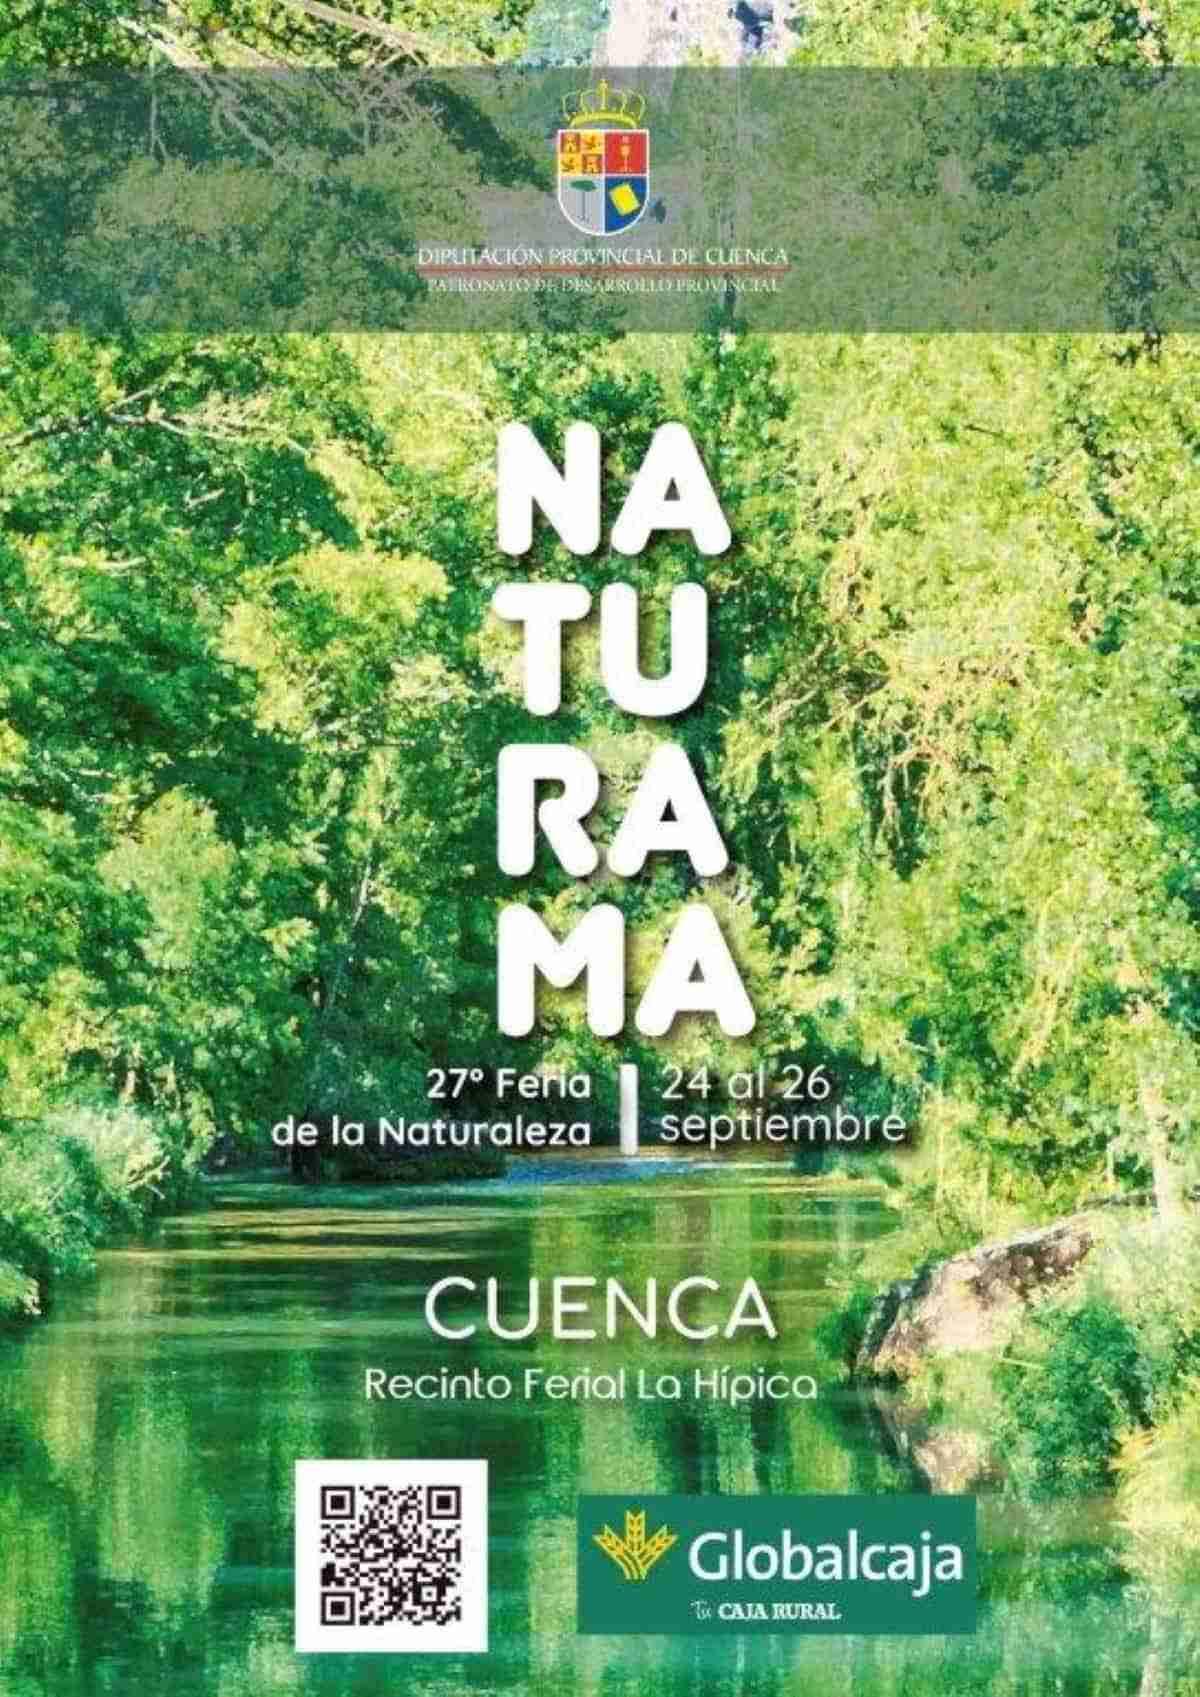 feria naturama 2021 en cuenca